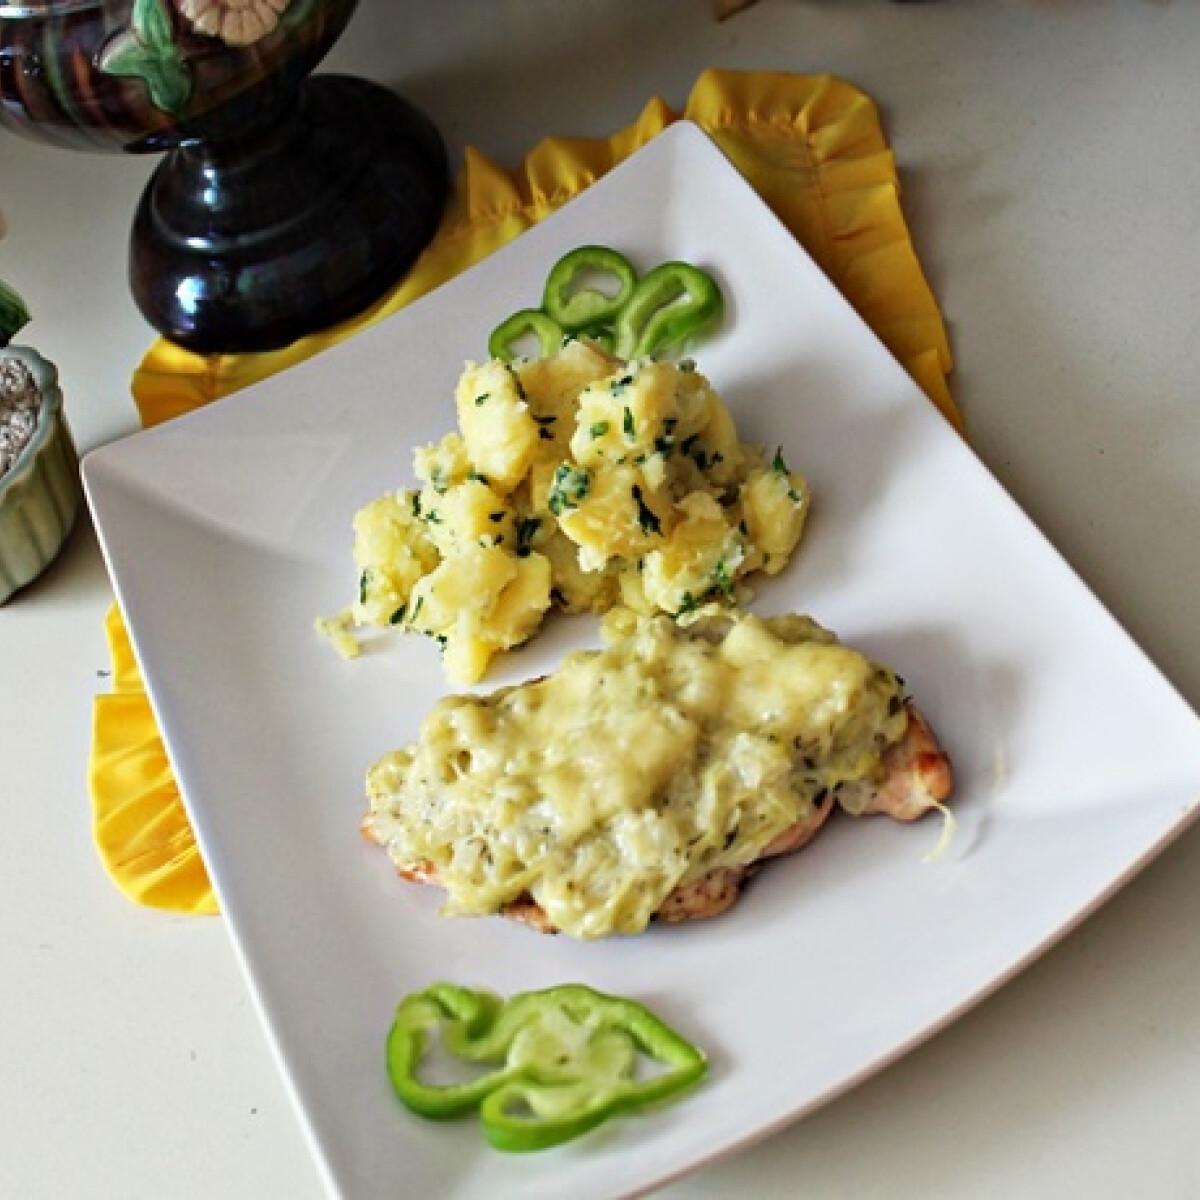 Csirkemell sajtos cukkiniraguval borítva